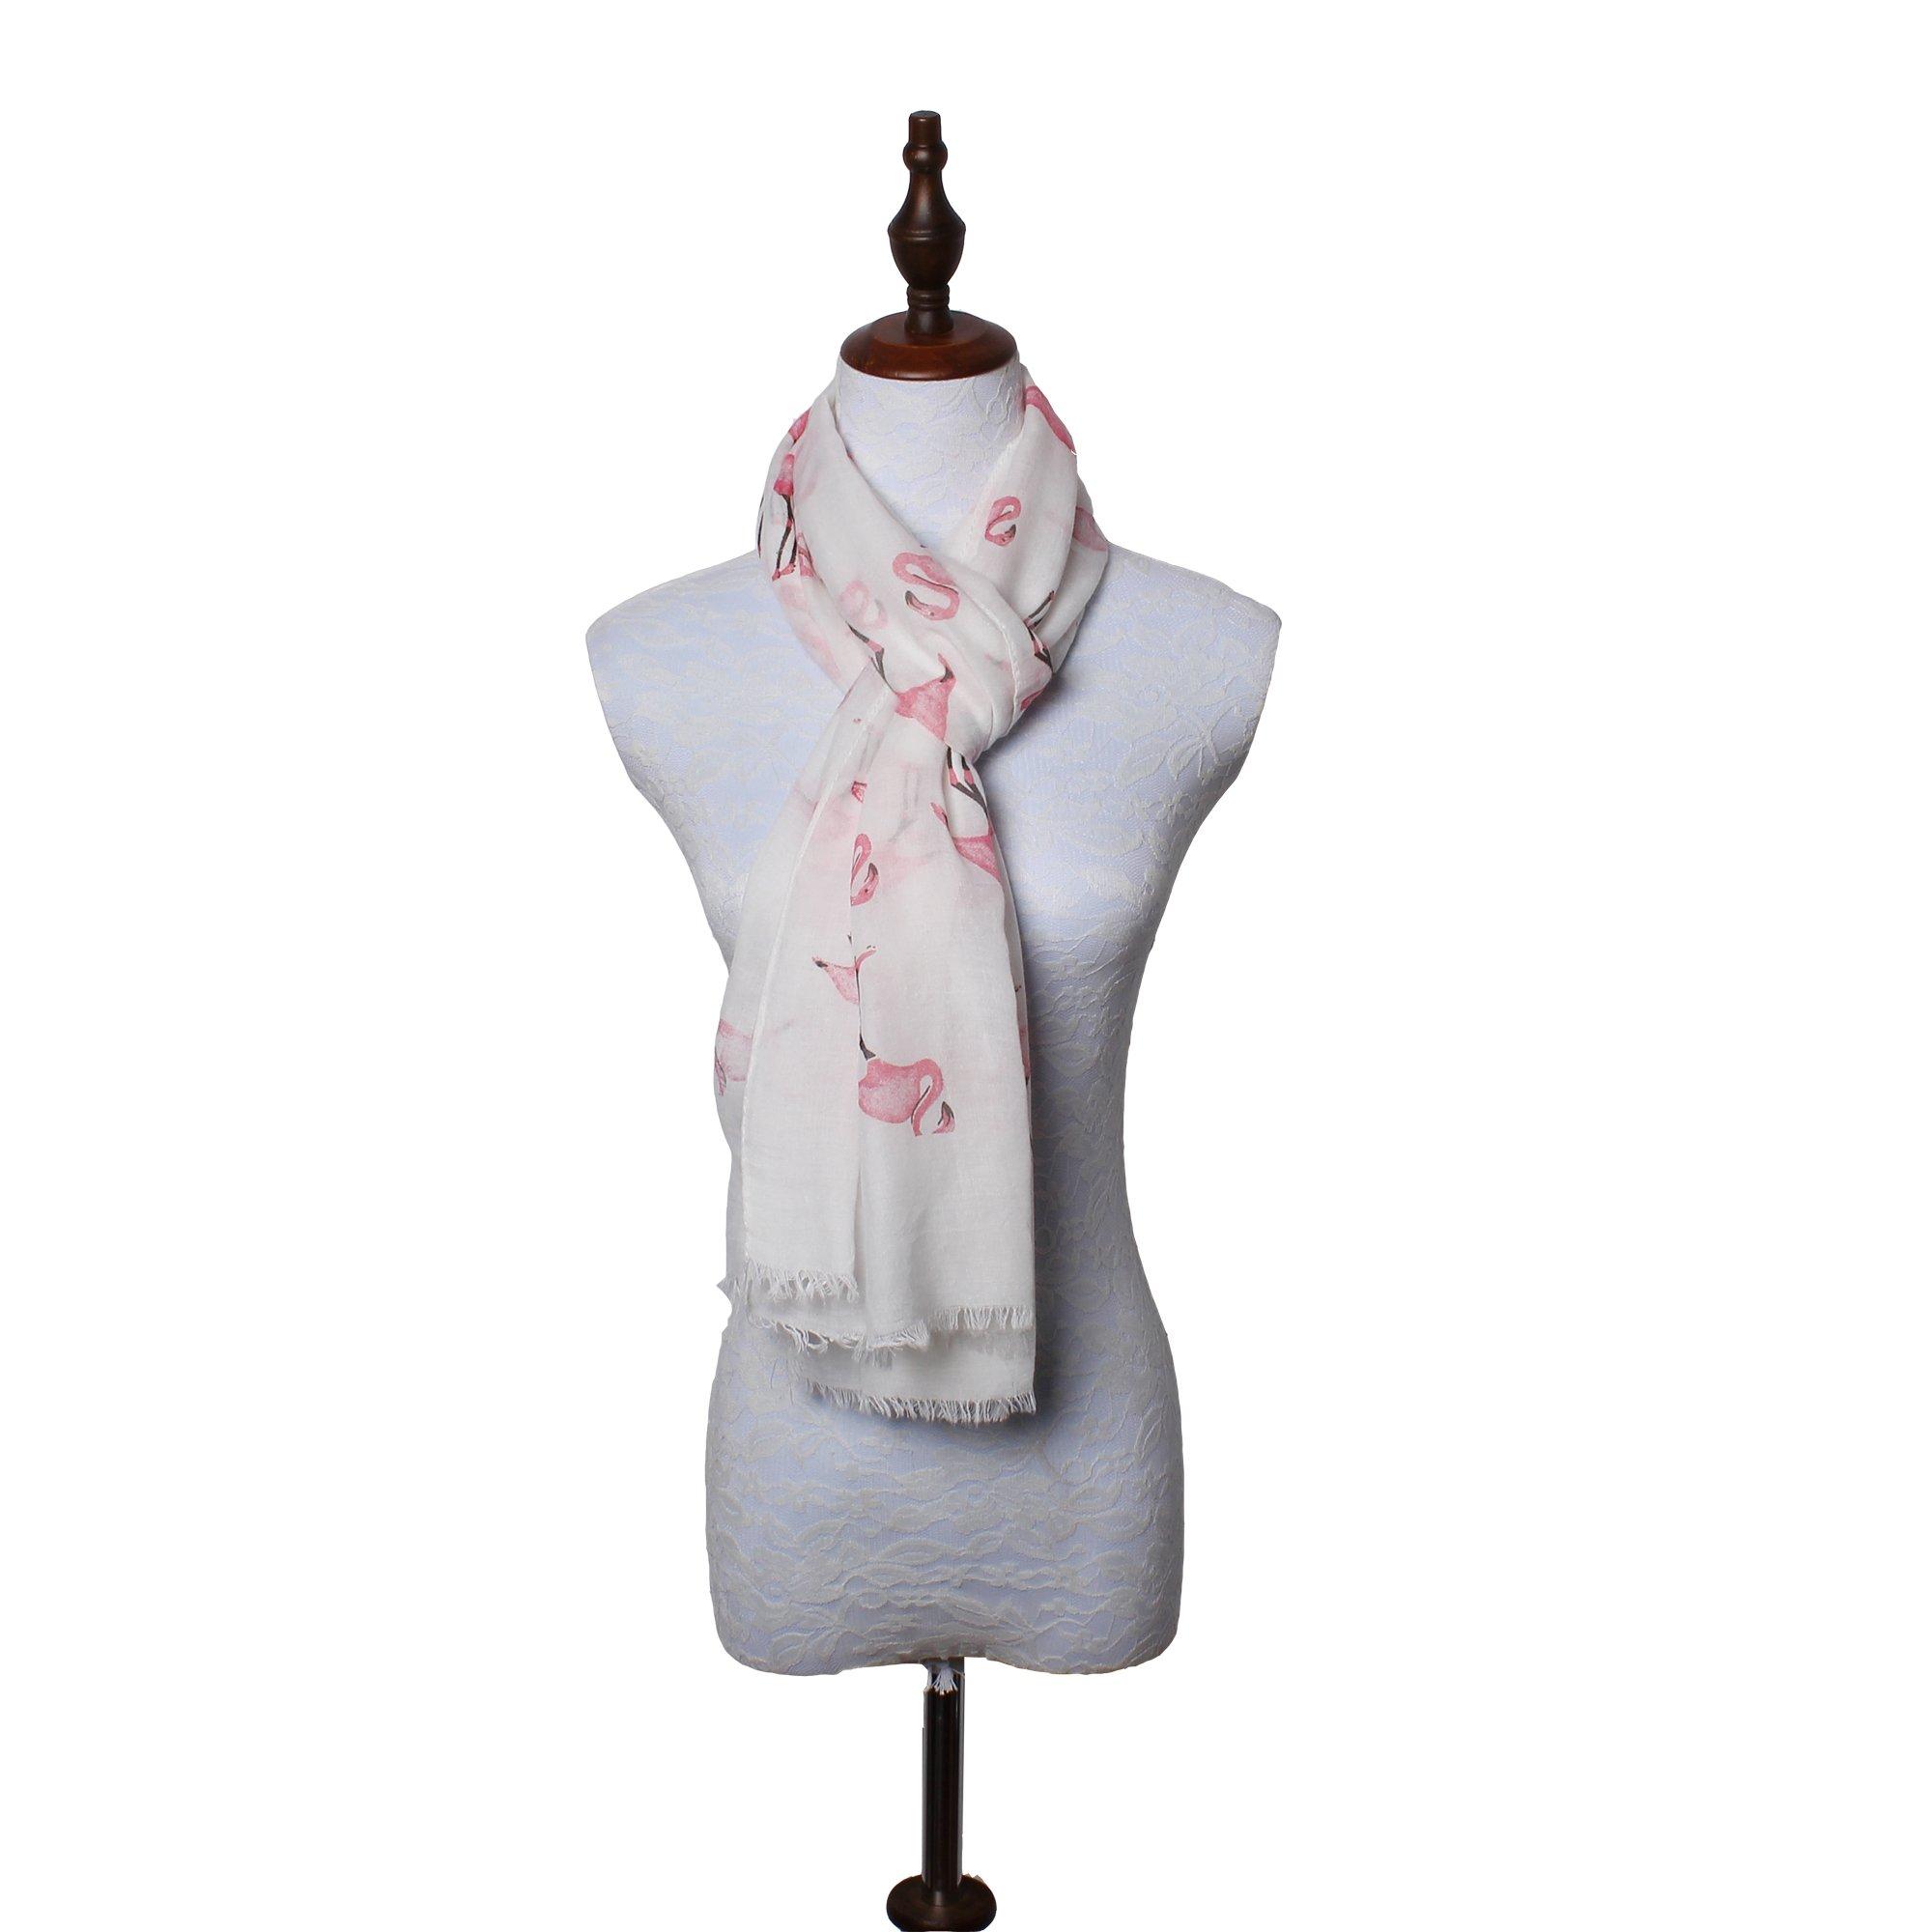 daguanjing 【Colorful Spring Inspired】 Women's Lightweight Fashion Scarf, Floral and Modern Print Sheer Shawl Wrap Flamingo by daguanjing (Image #7)